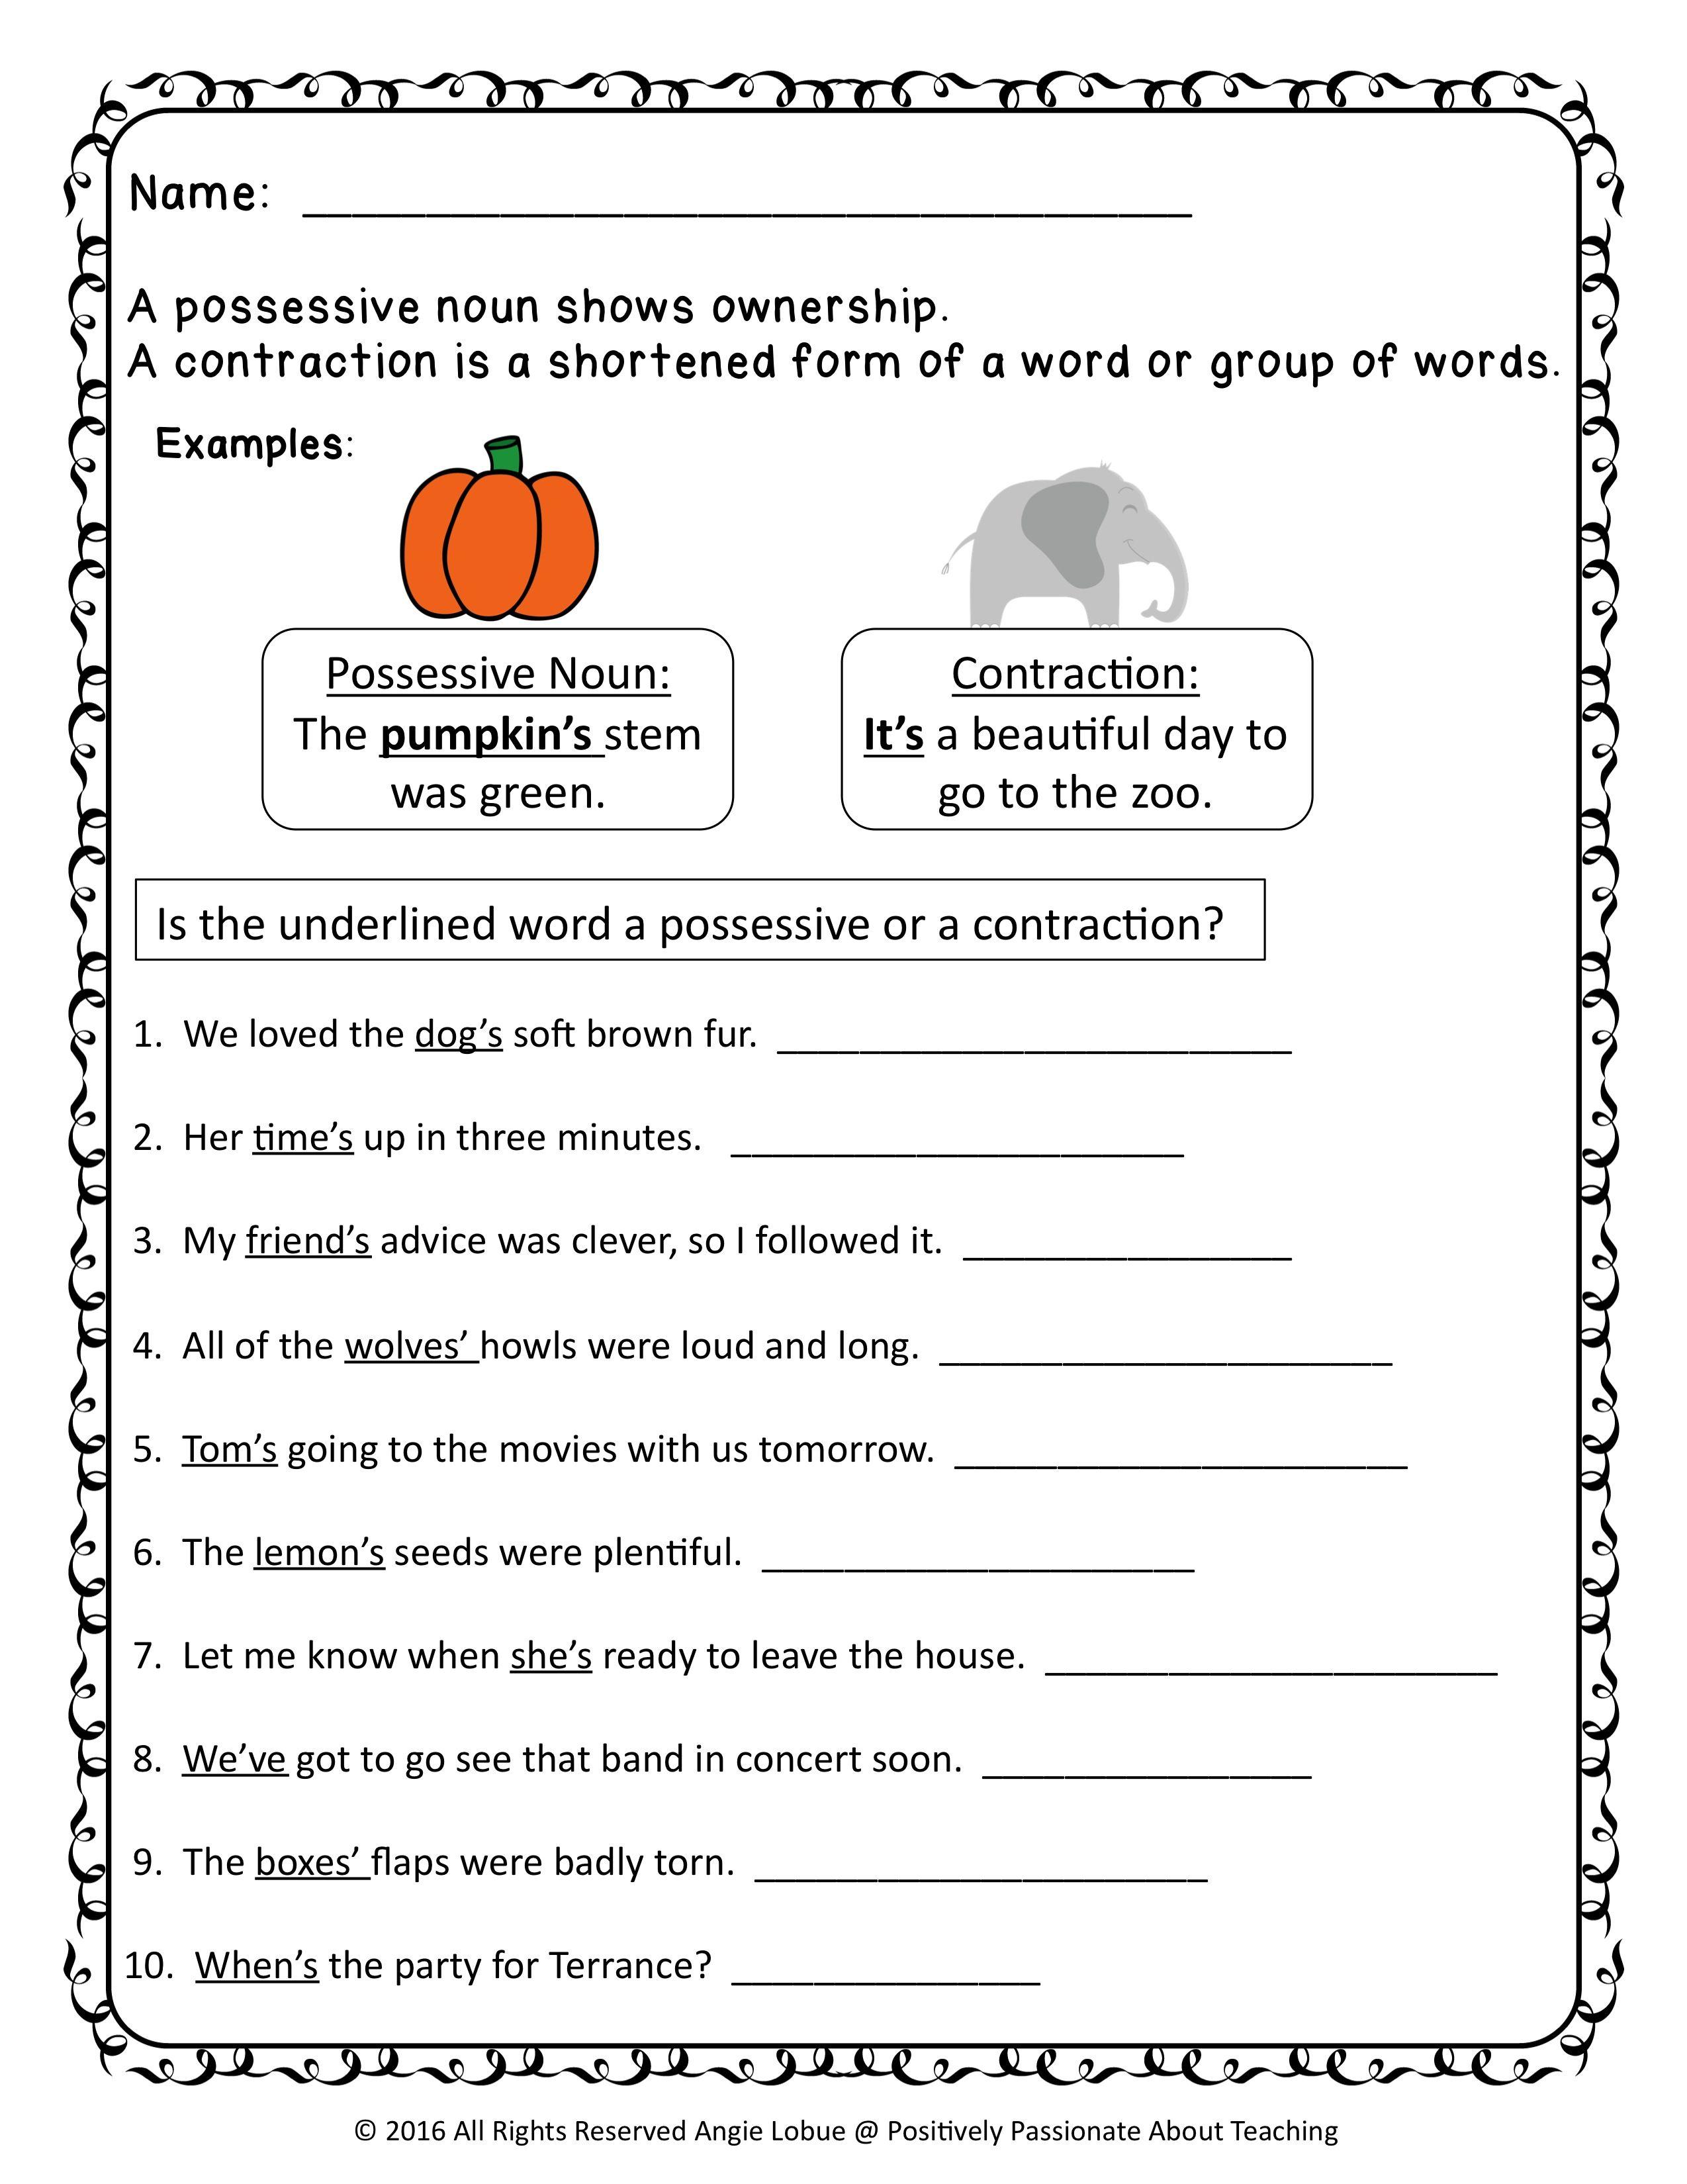 Grammar Worksheet Possessive Pronouns Answer Key